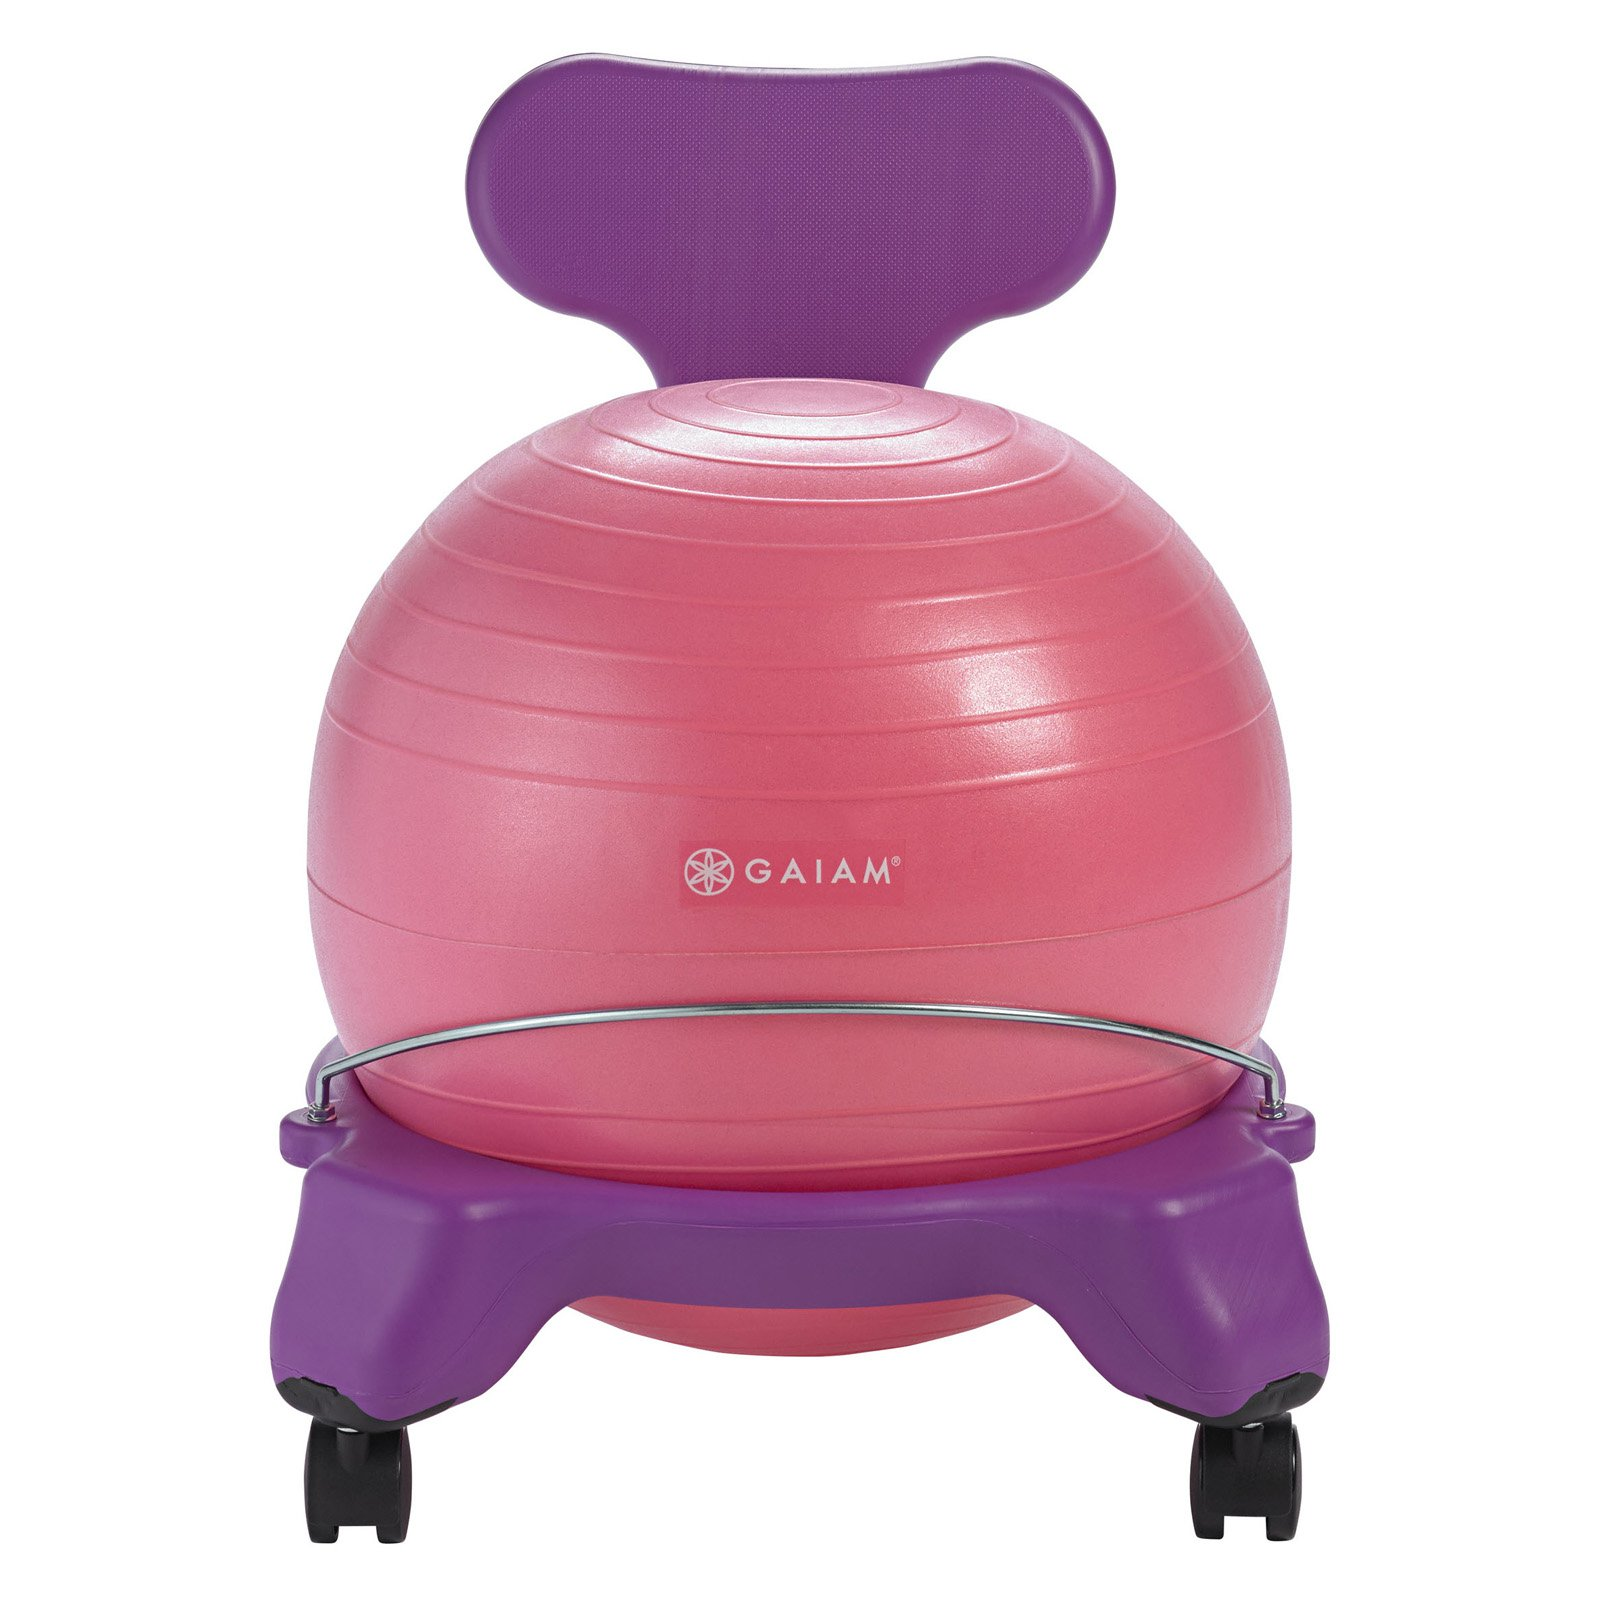 ball chairs massage chair cover for sale gaiam kids balance purple pink walmart com